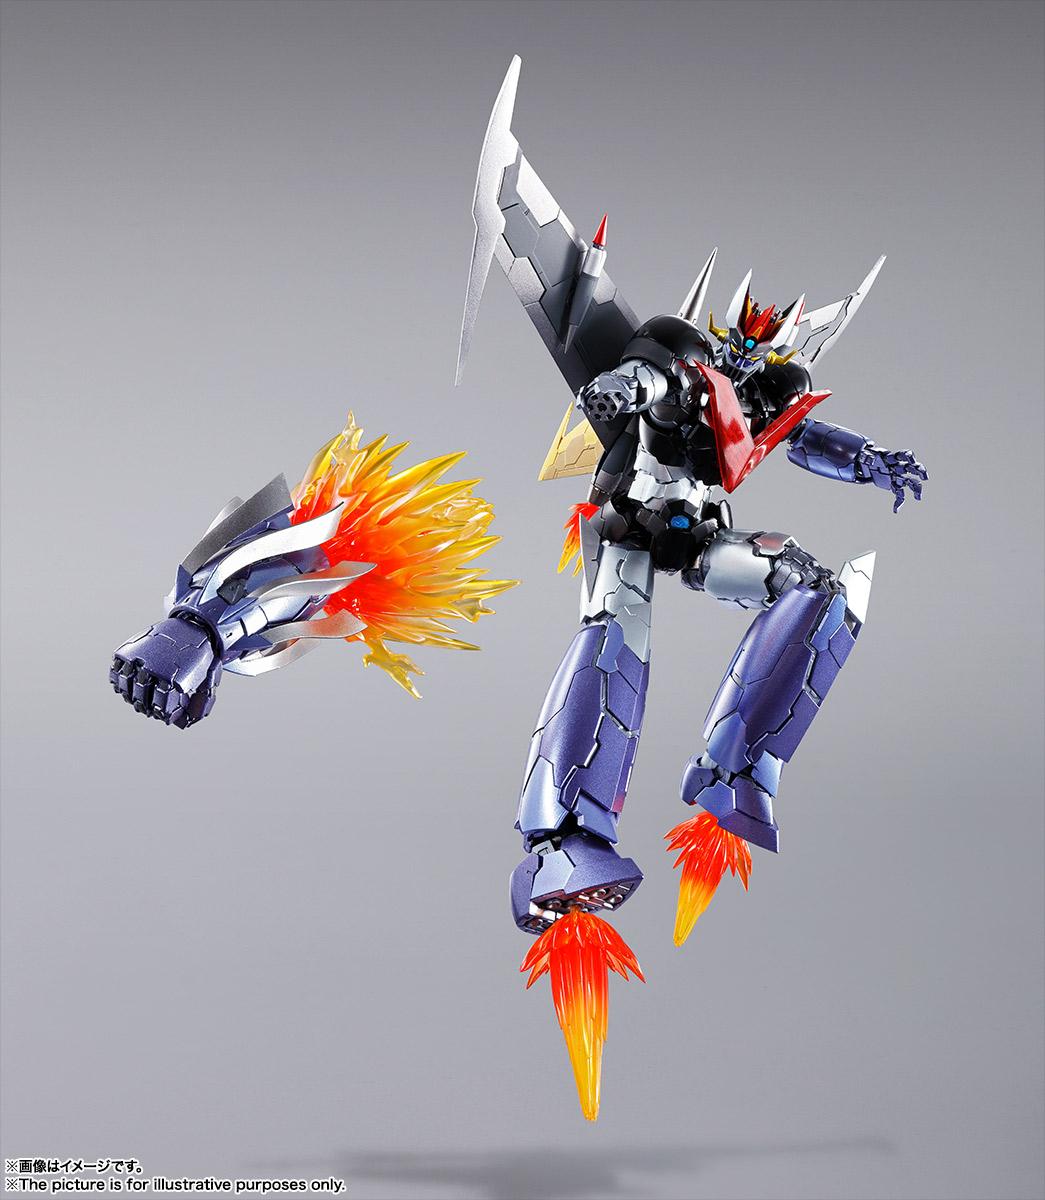 METAL BUILD『グレートマジンガー』マジンガーZ / INFINITY 可動フィギュア-013